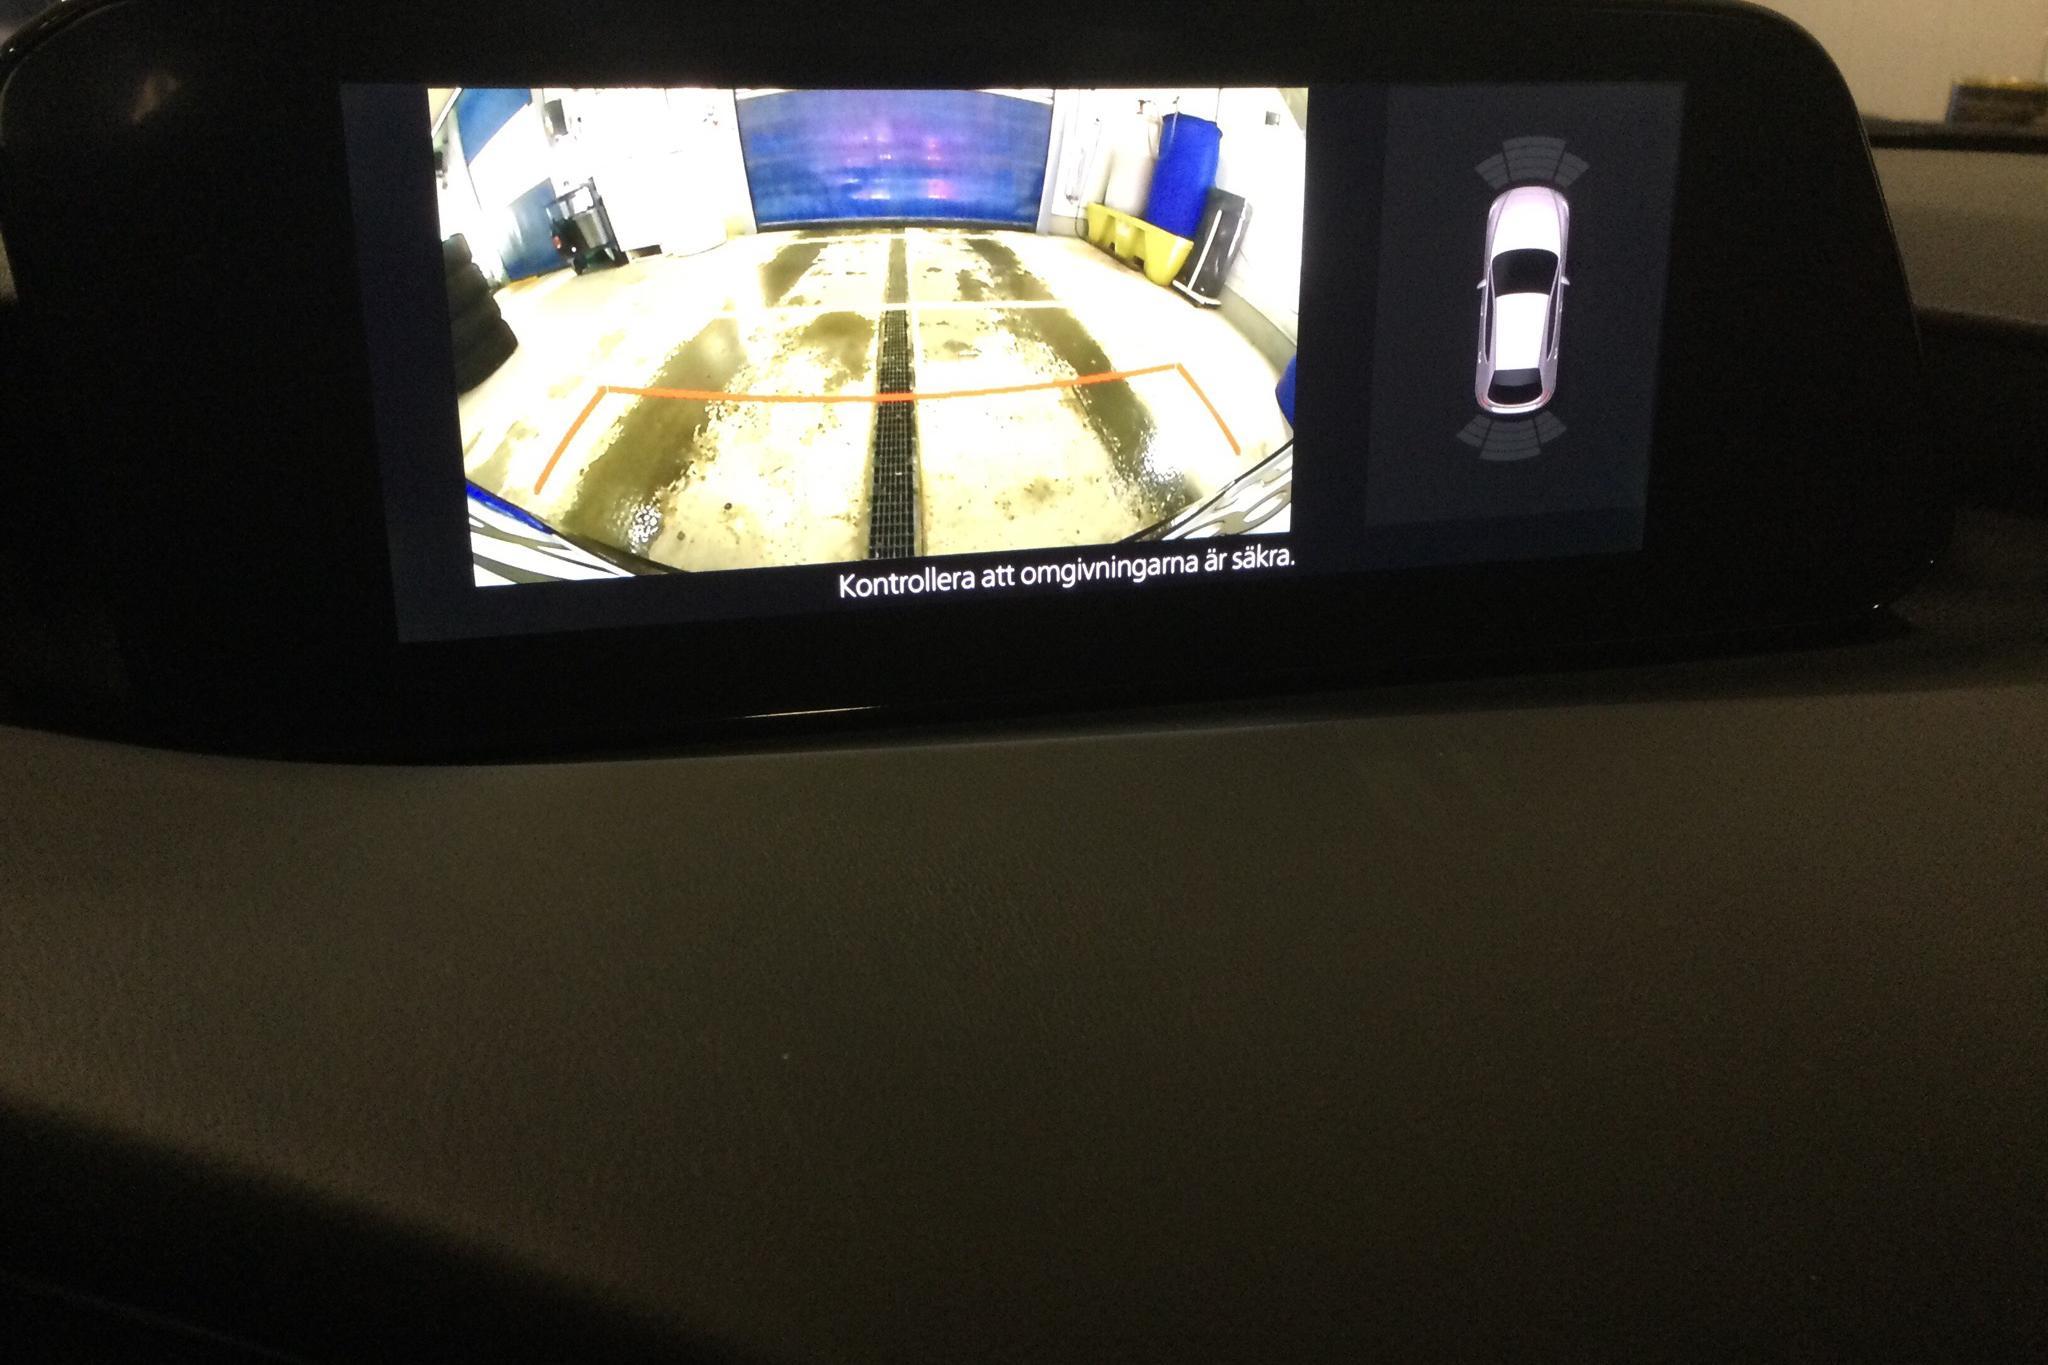 Mazda 3 2.0 5dr (180hk) - 3 430 mil - Manuell - vit - 2020